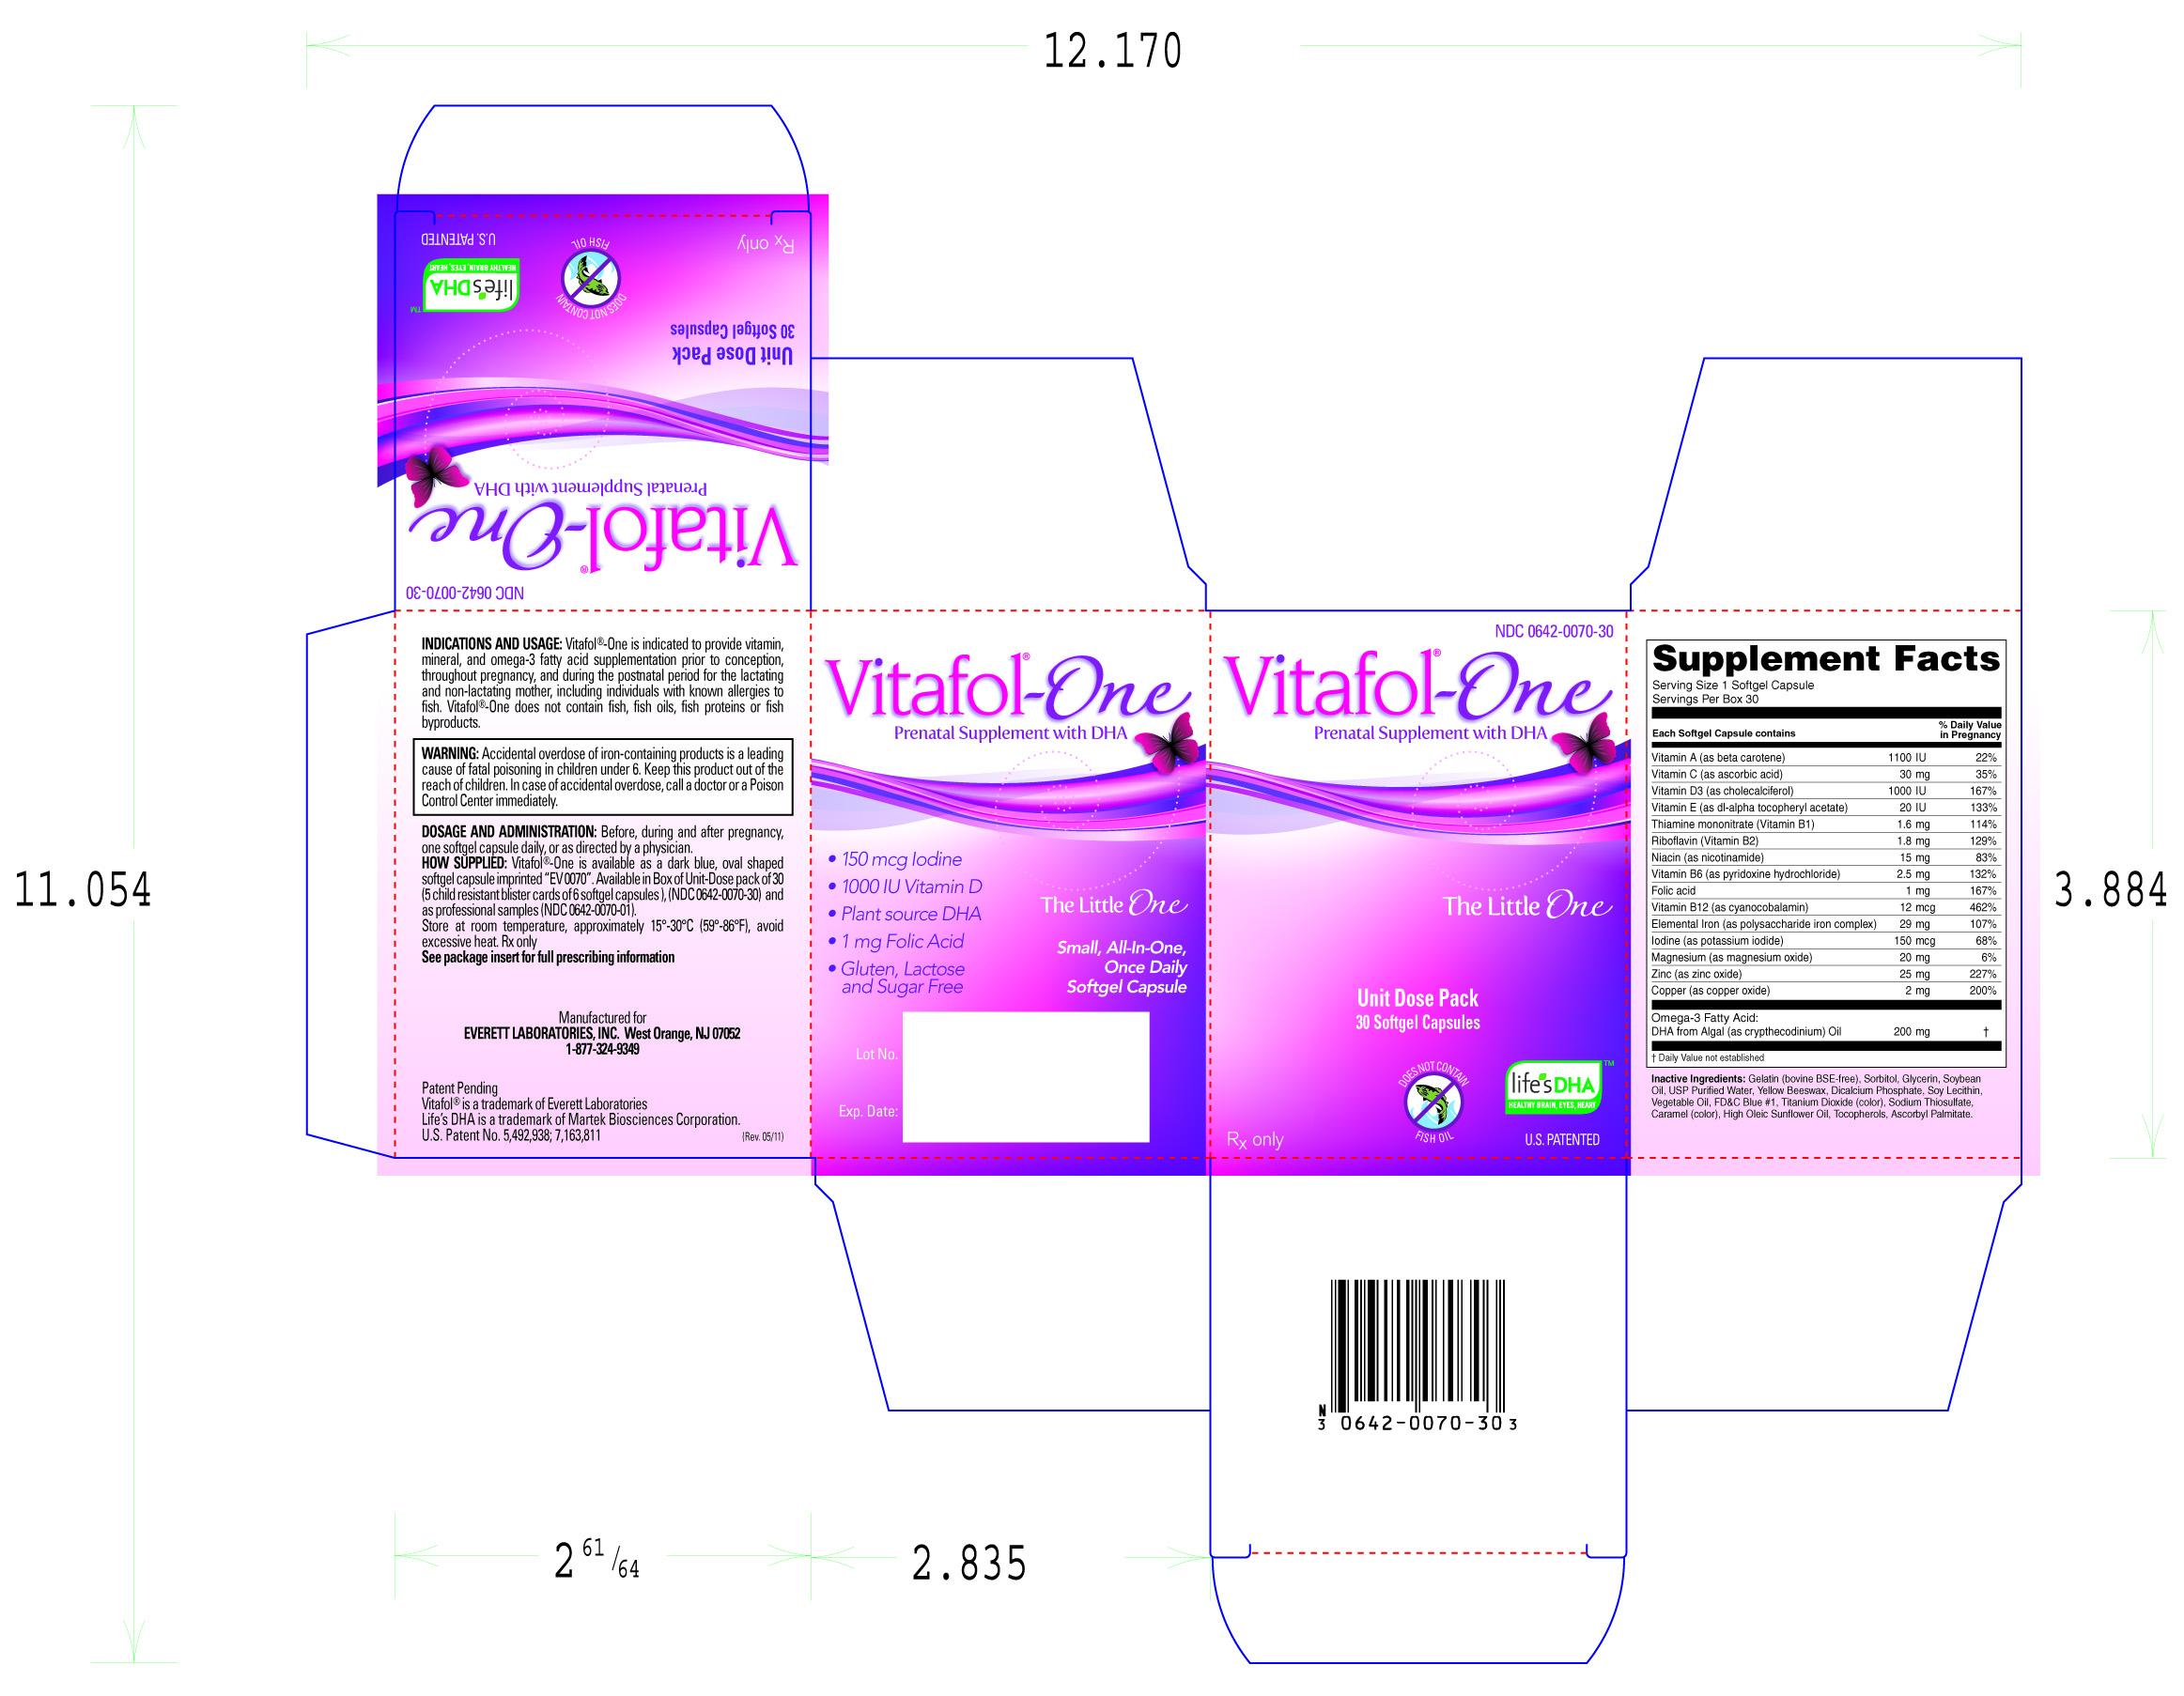 Plaquenil 200 mg price philippines